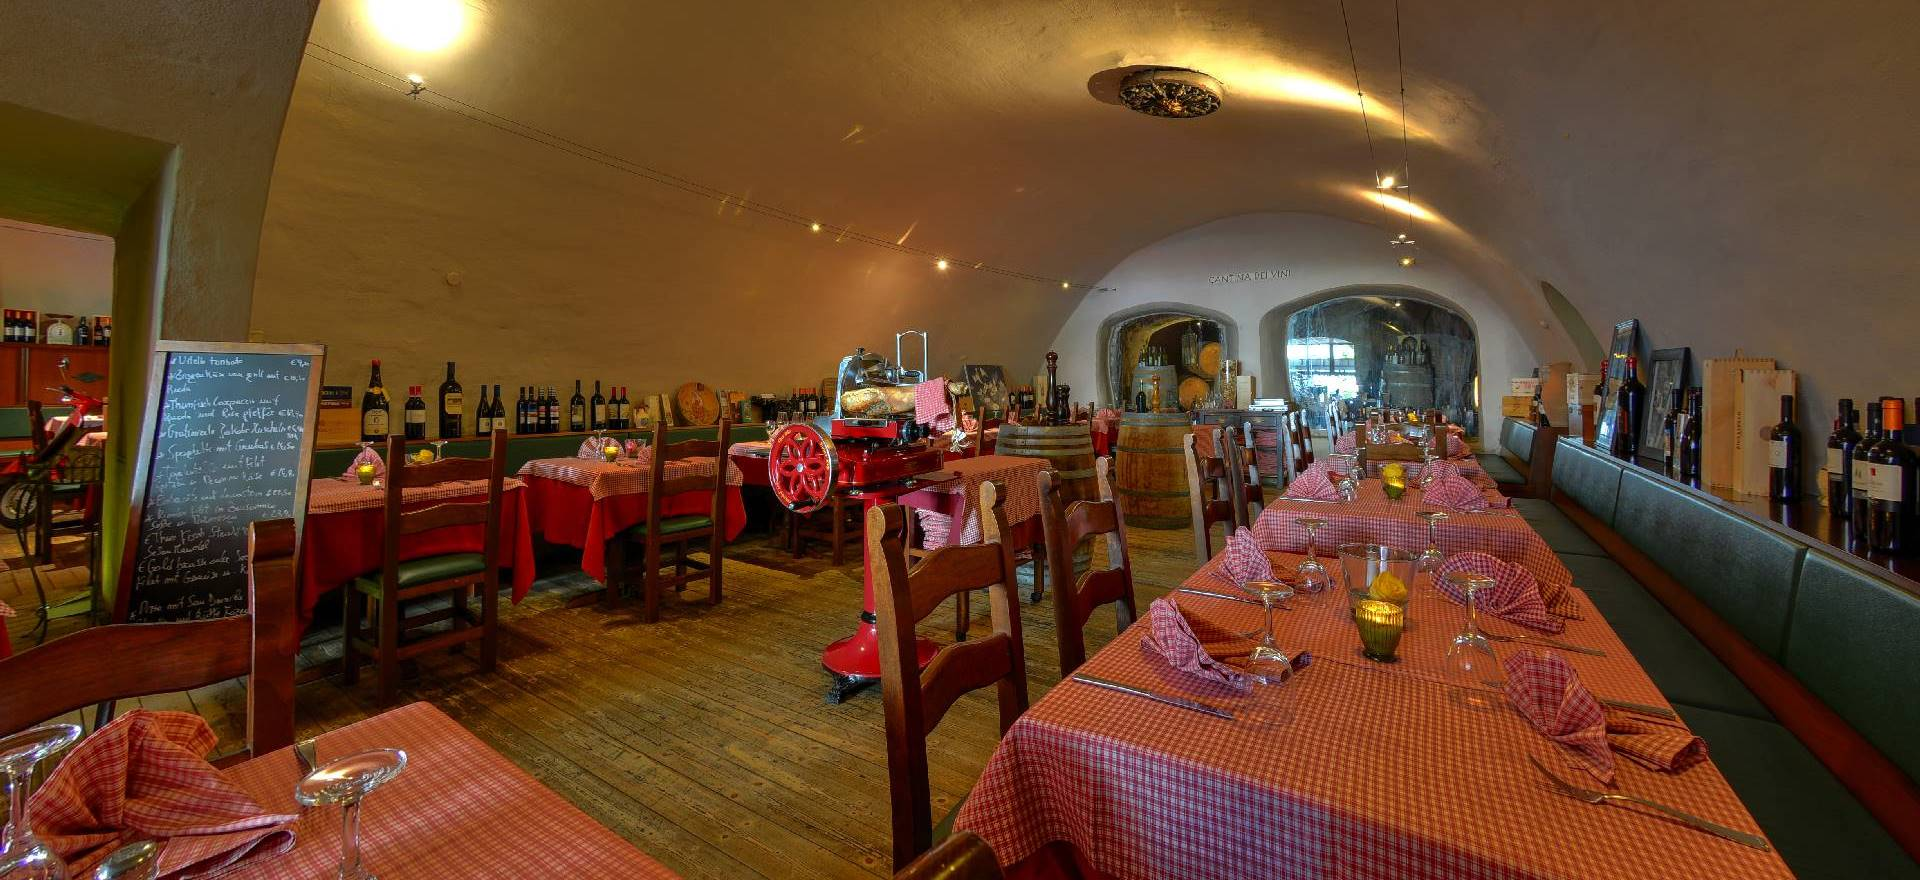 Taverna Italiana • Cucina con Pizzeria • Wasserburg a. Inn ...